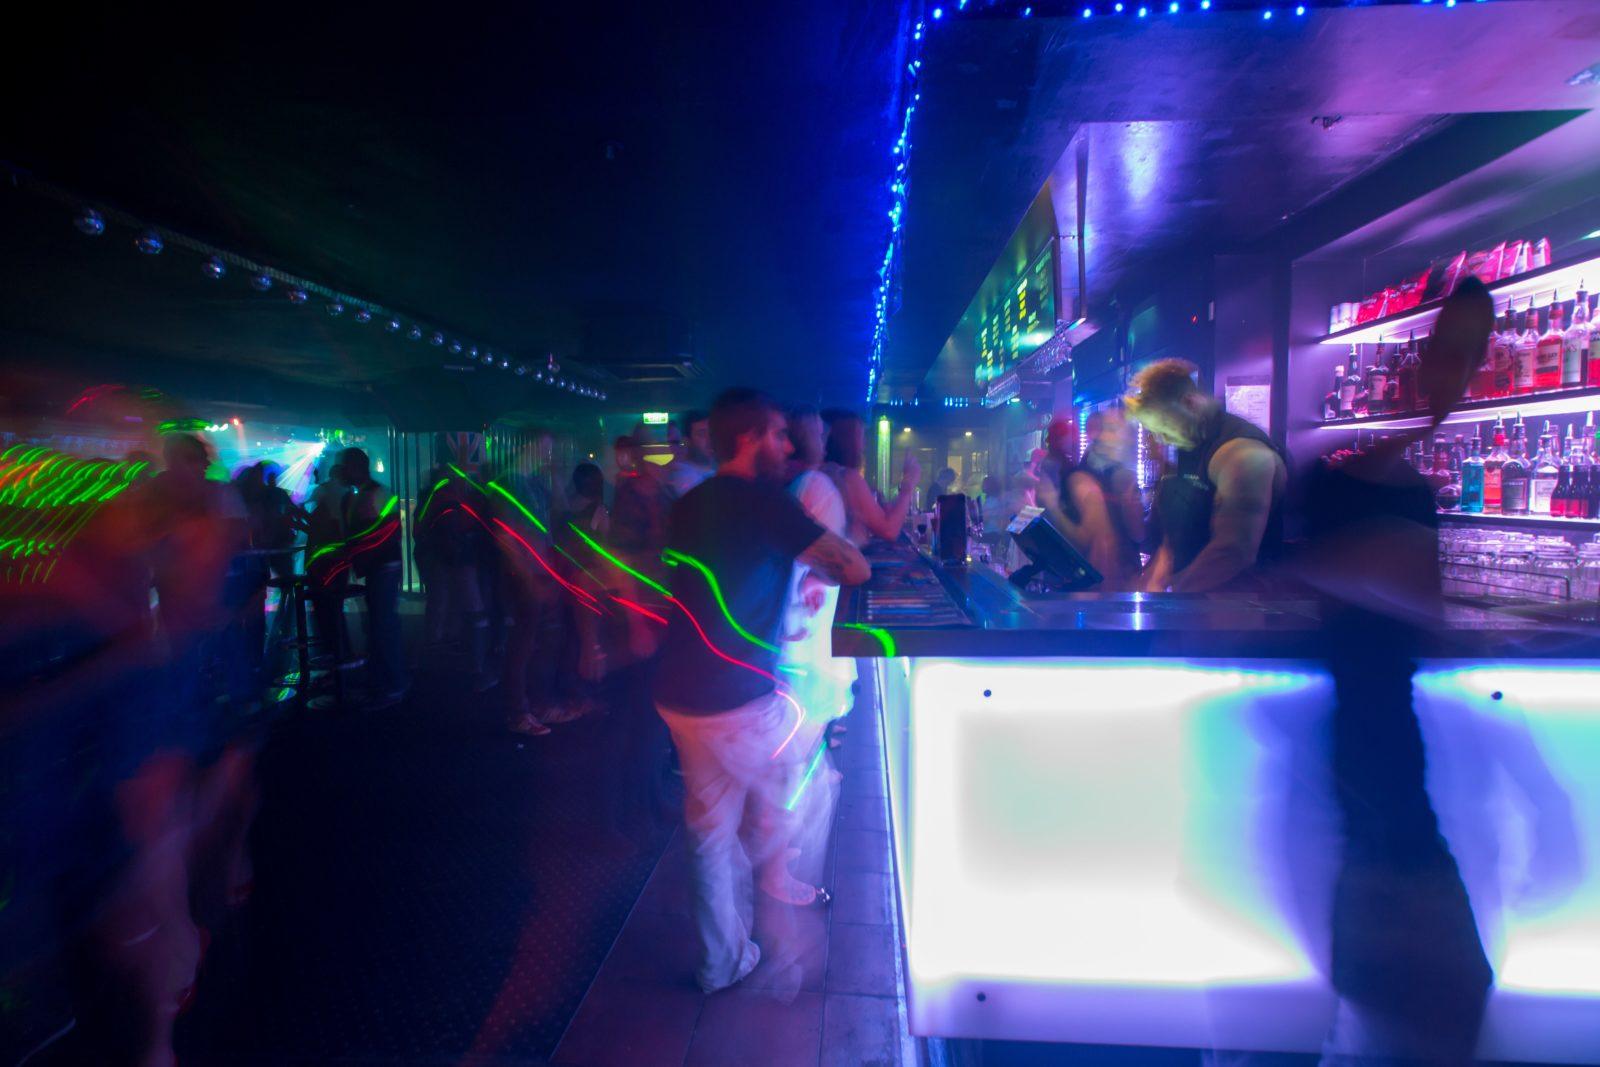 Cube nightclub